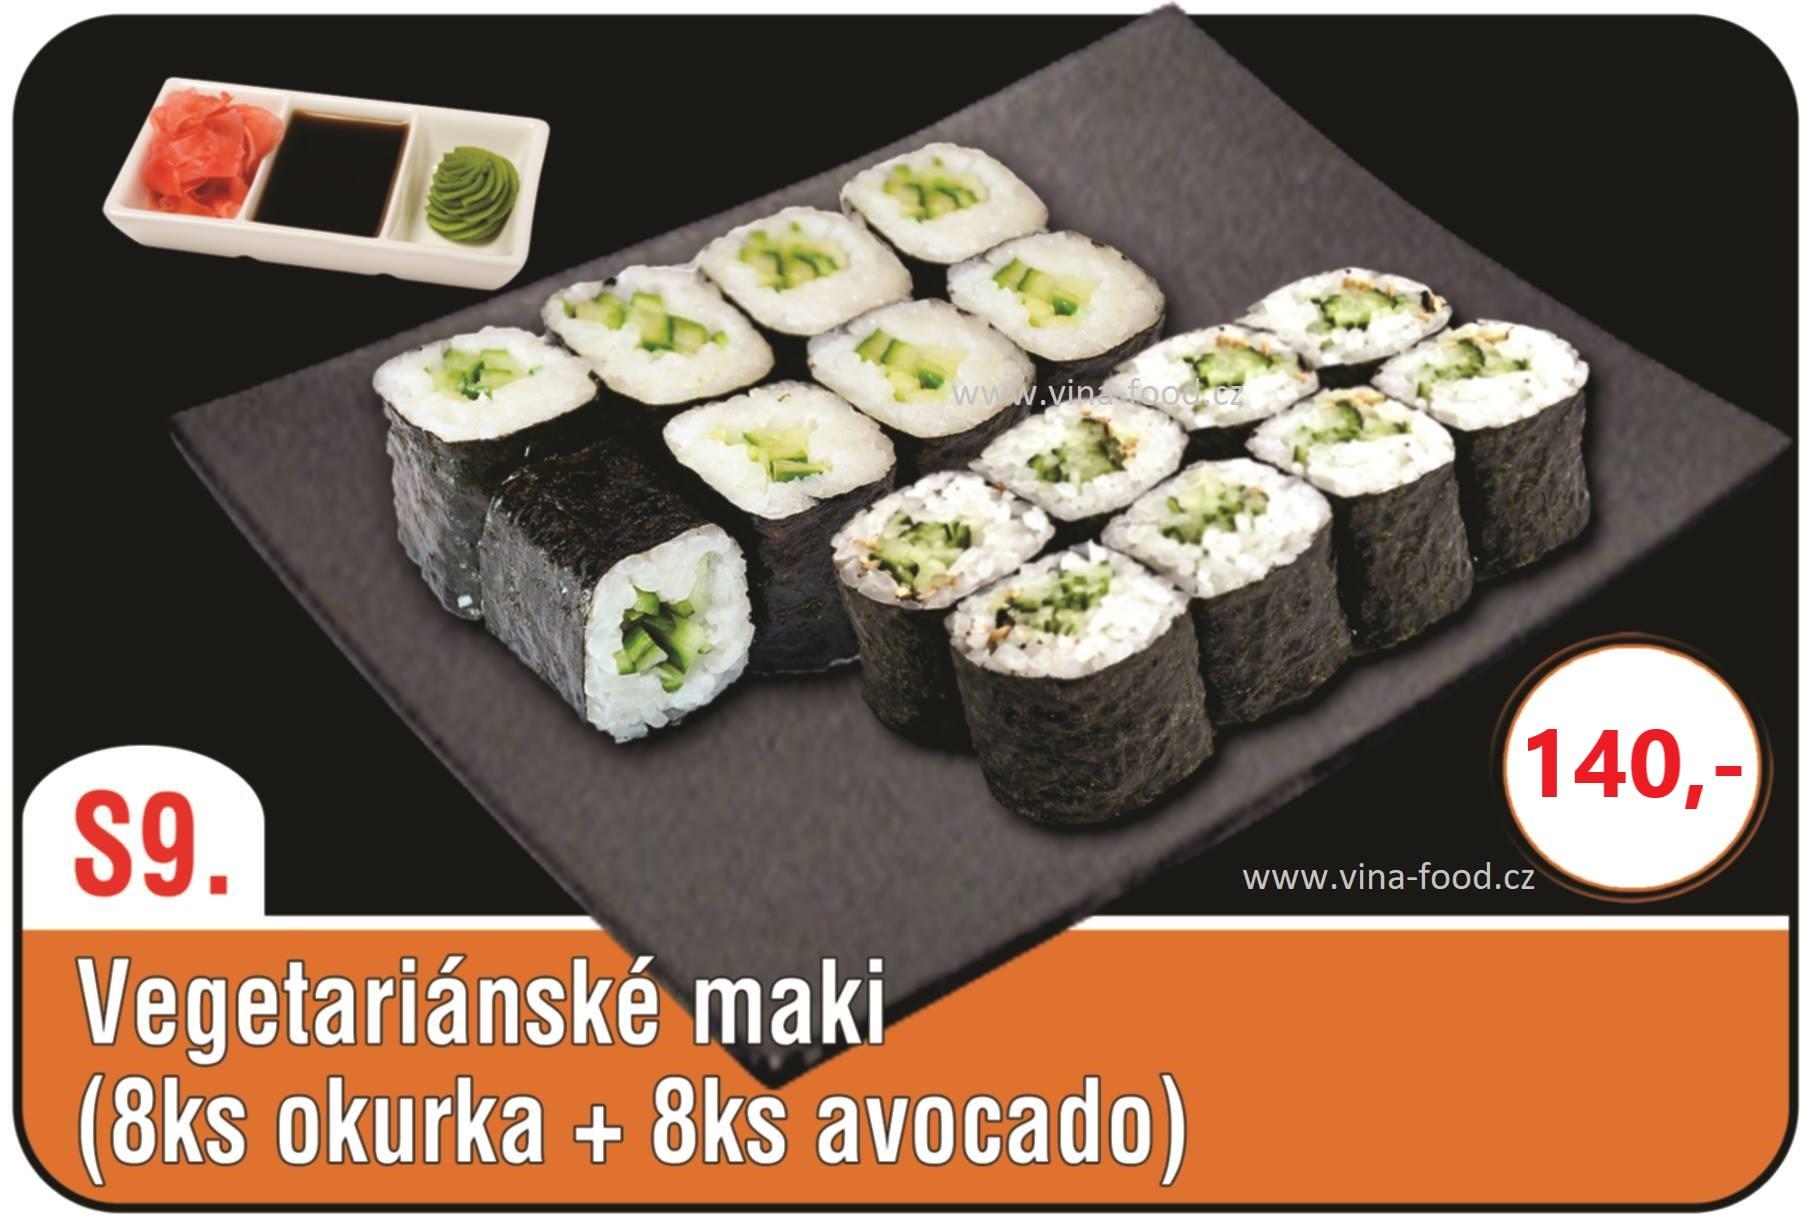 Vegetariánské maki (8ks okurka + 8ks avocado)